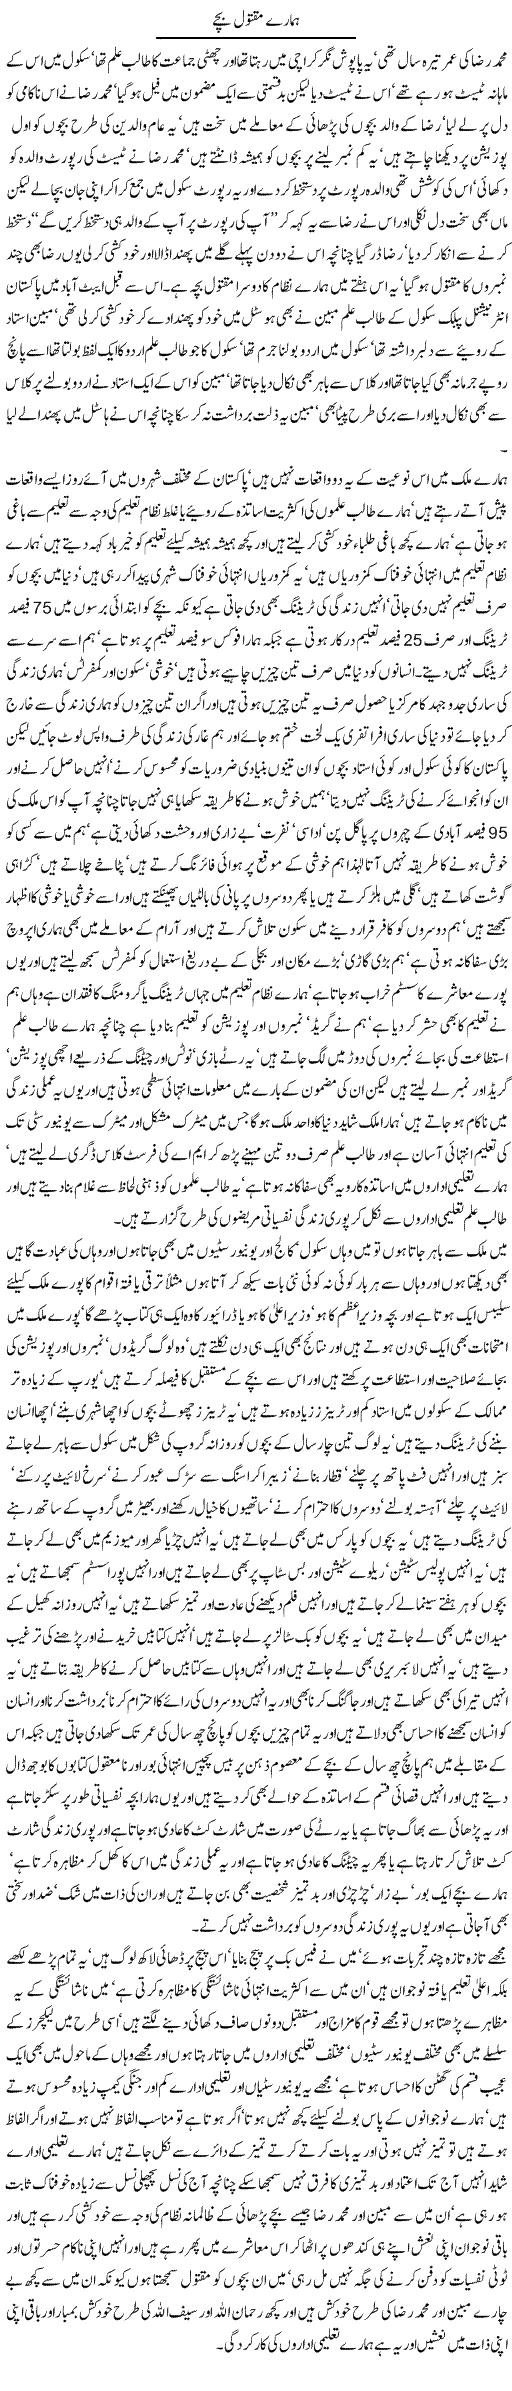 javed chaudhry zero point pdf